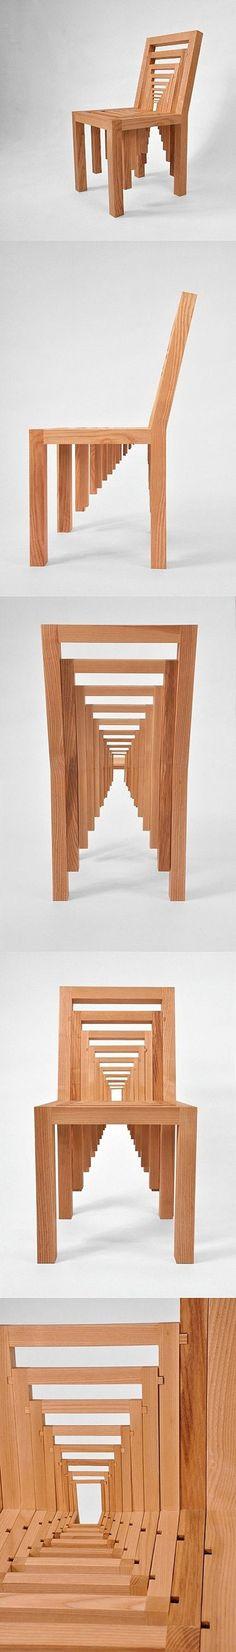 La silla infinita. http://www.alquiler.com/eventos